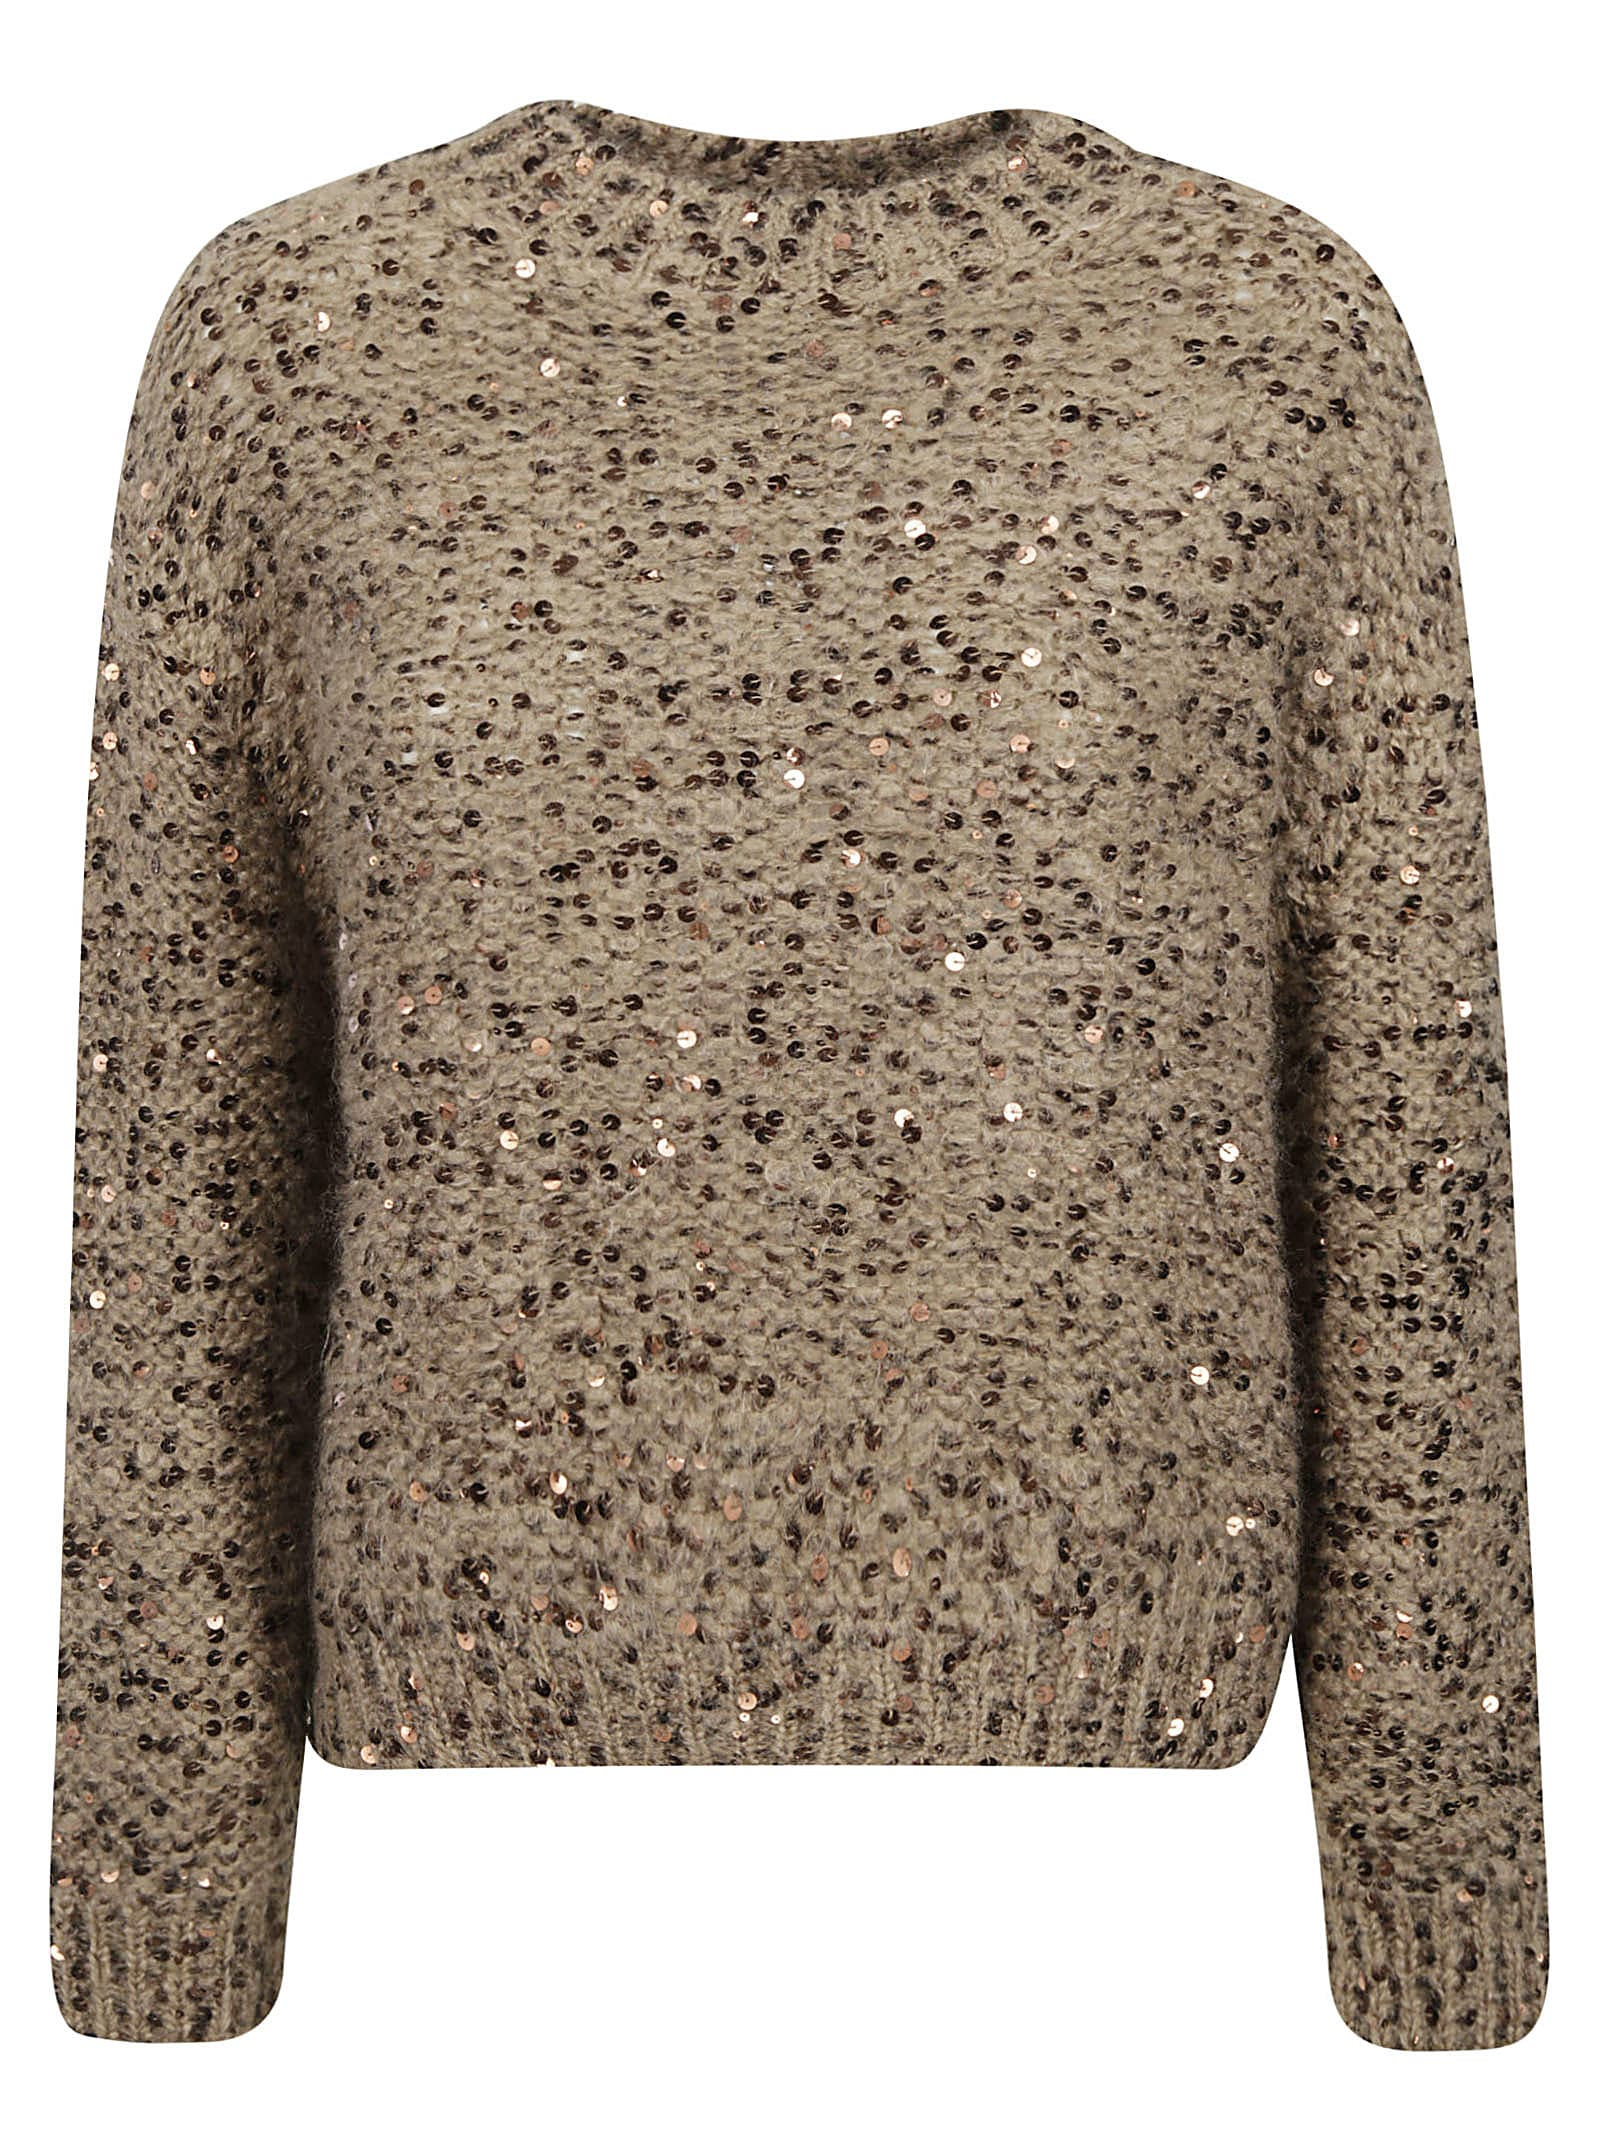 Brunello Cucinelli Sequin-coated Sweater